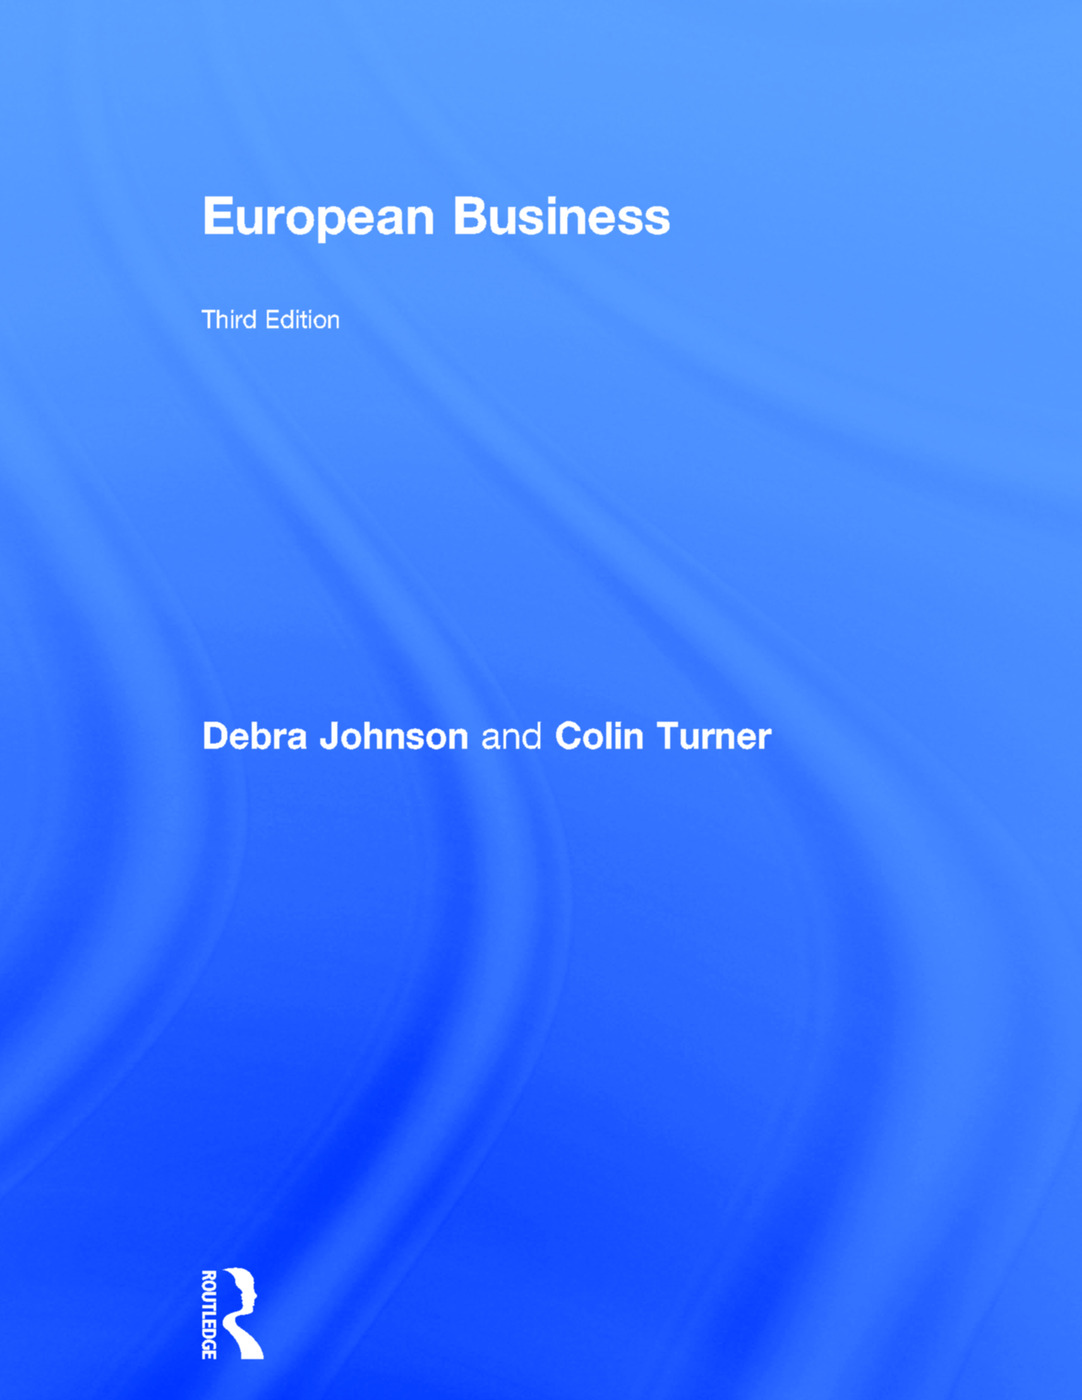 European Business book cover